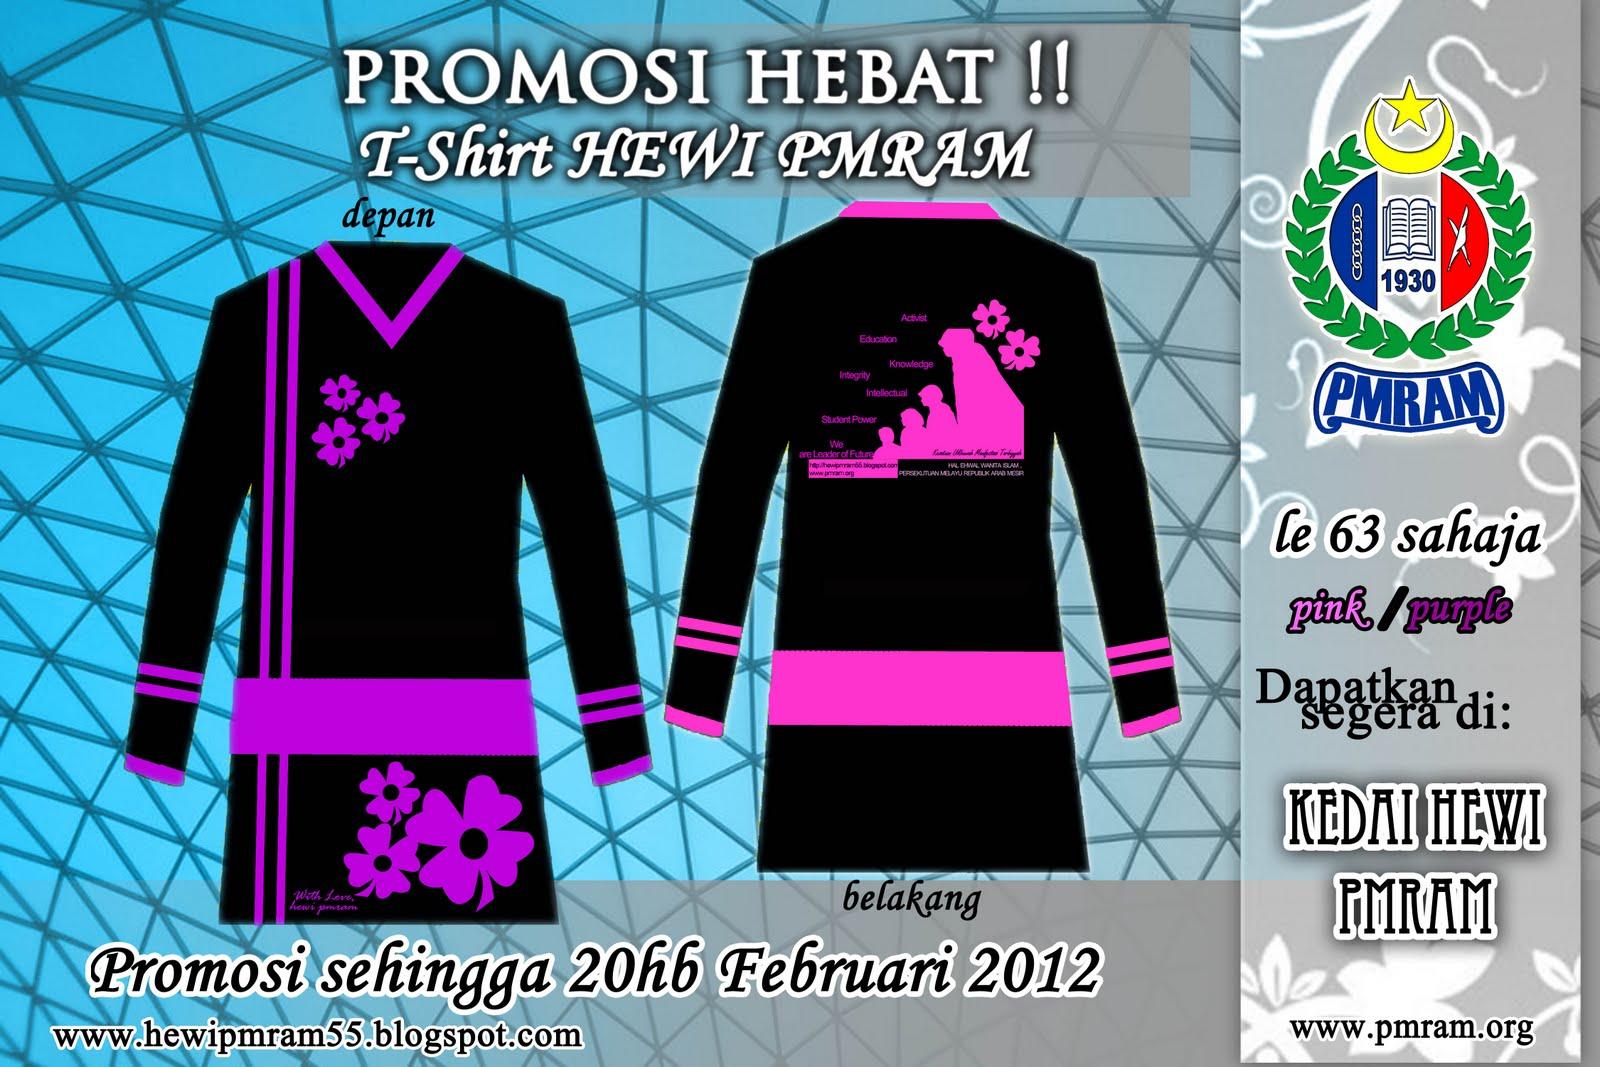 PROMOSI HEBAT !! T-Shirt HEWI PMRAM